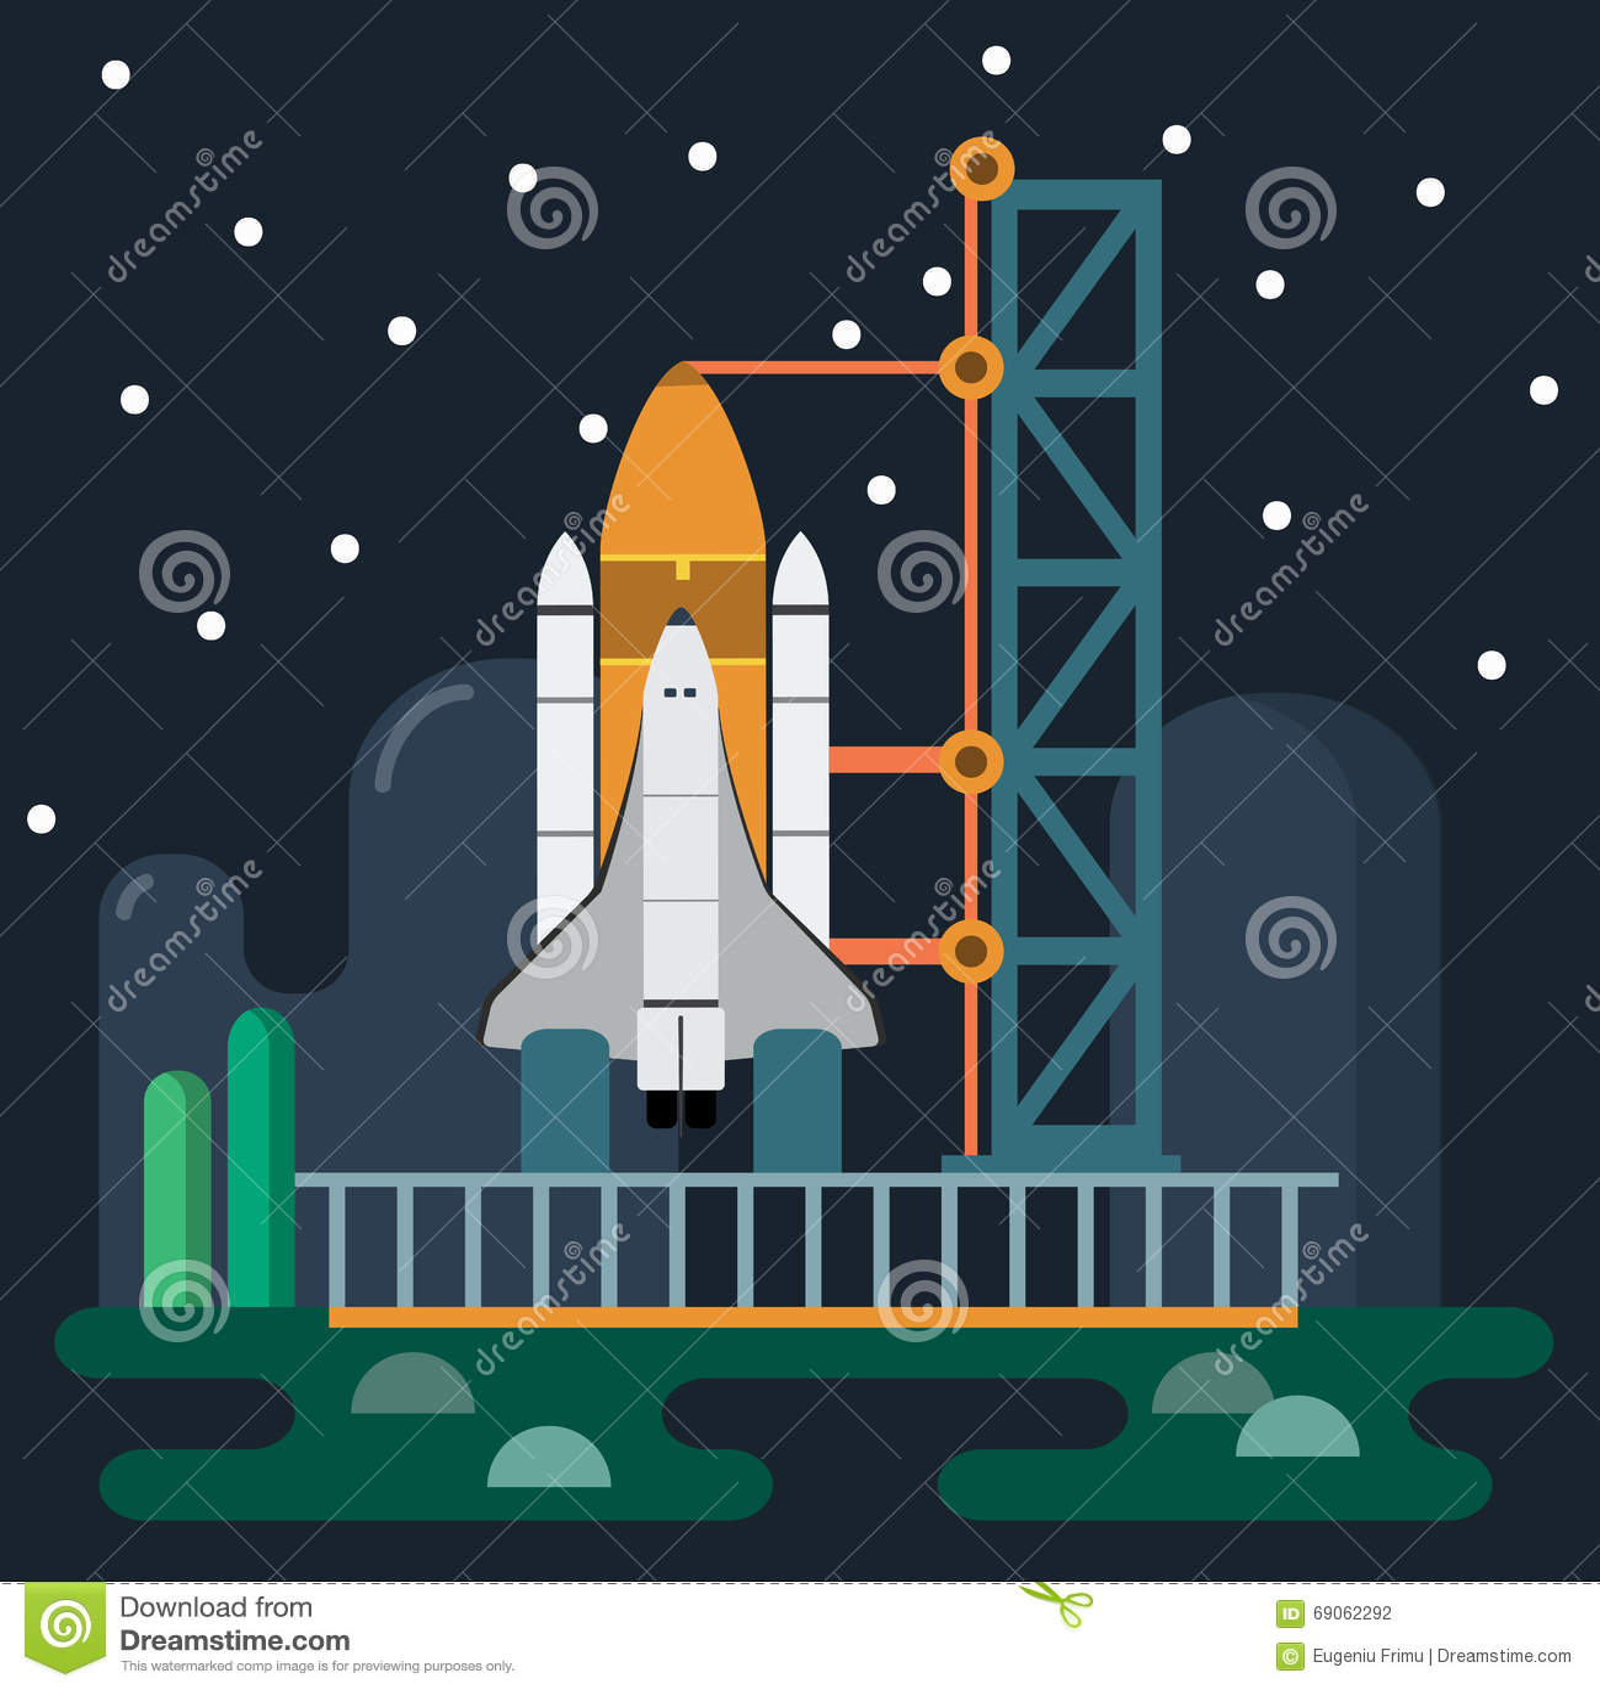 Rocket Before Launch Vector Illustration Stock Vector